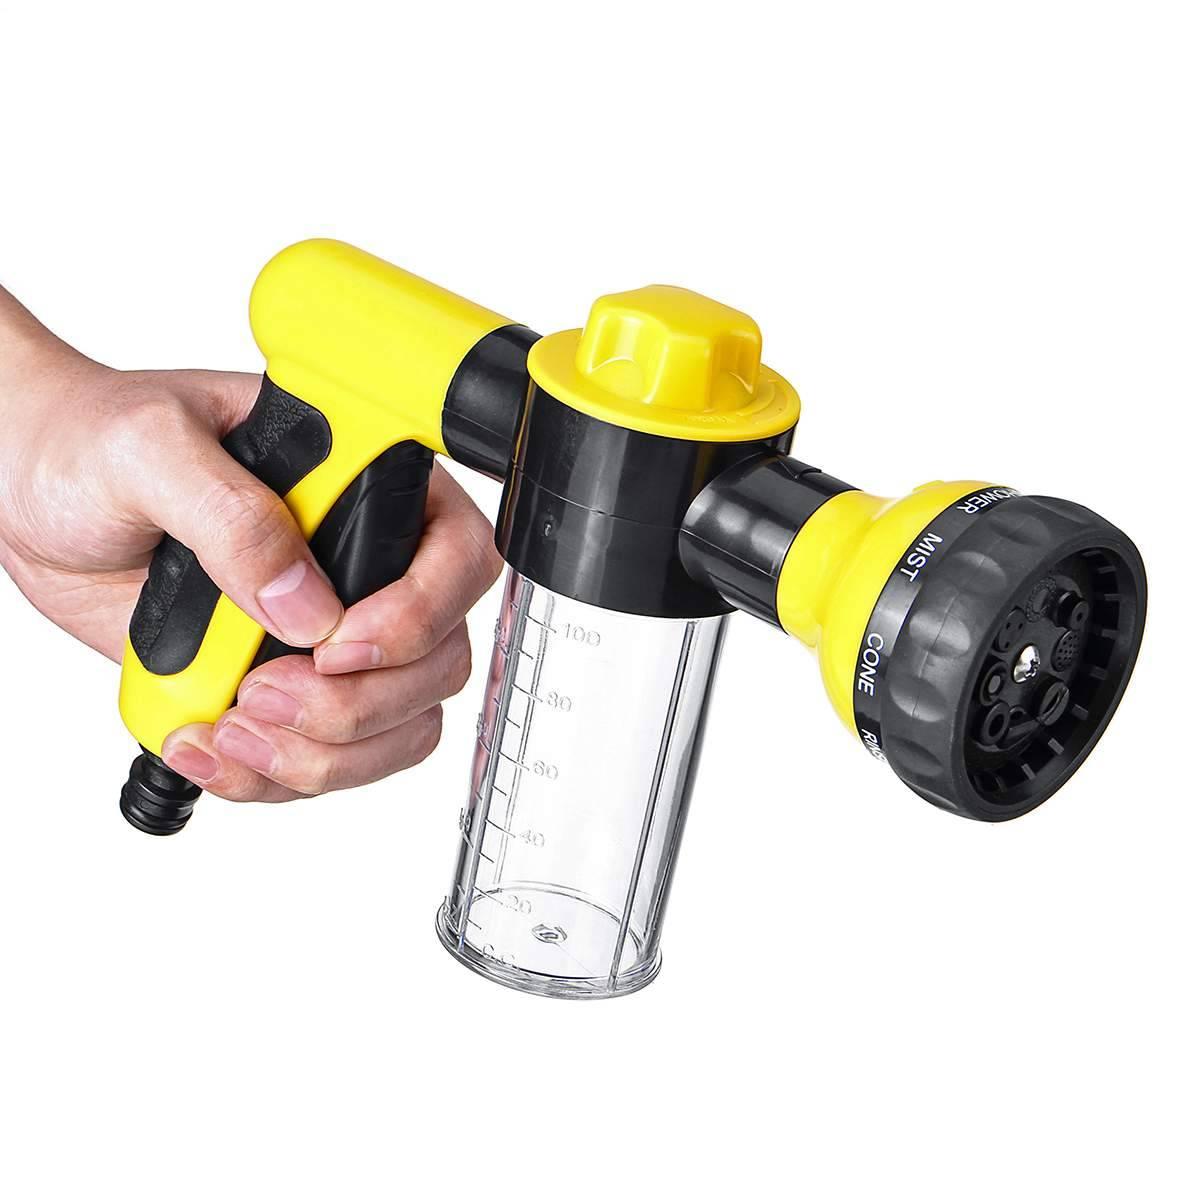 Hose Sprayer Nozzle